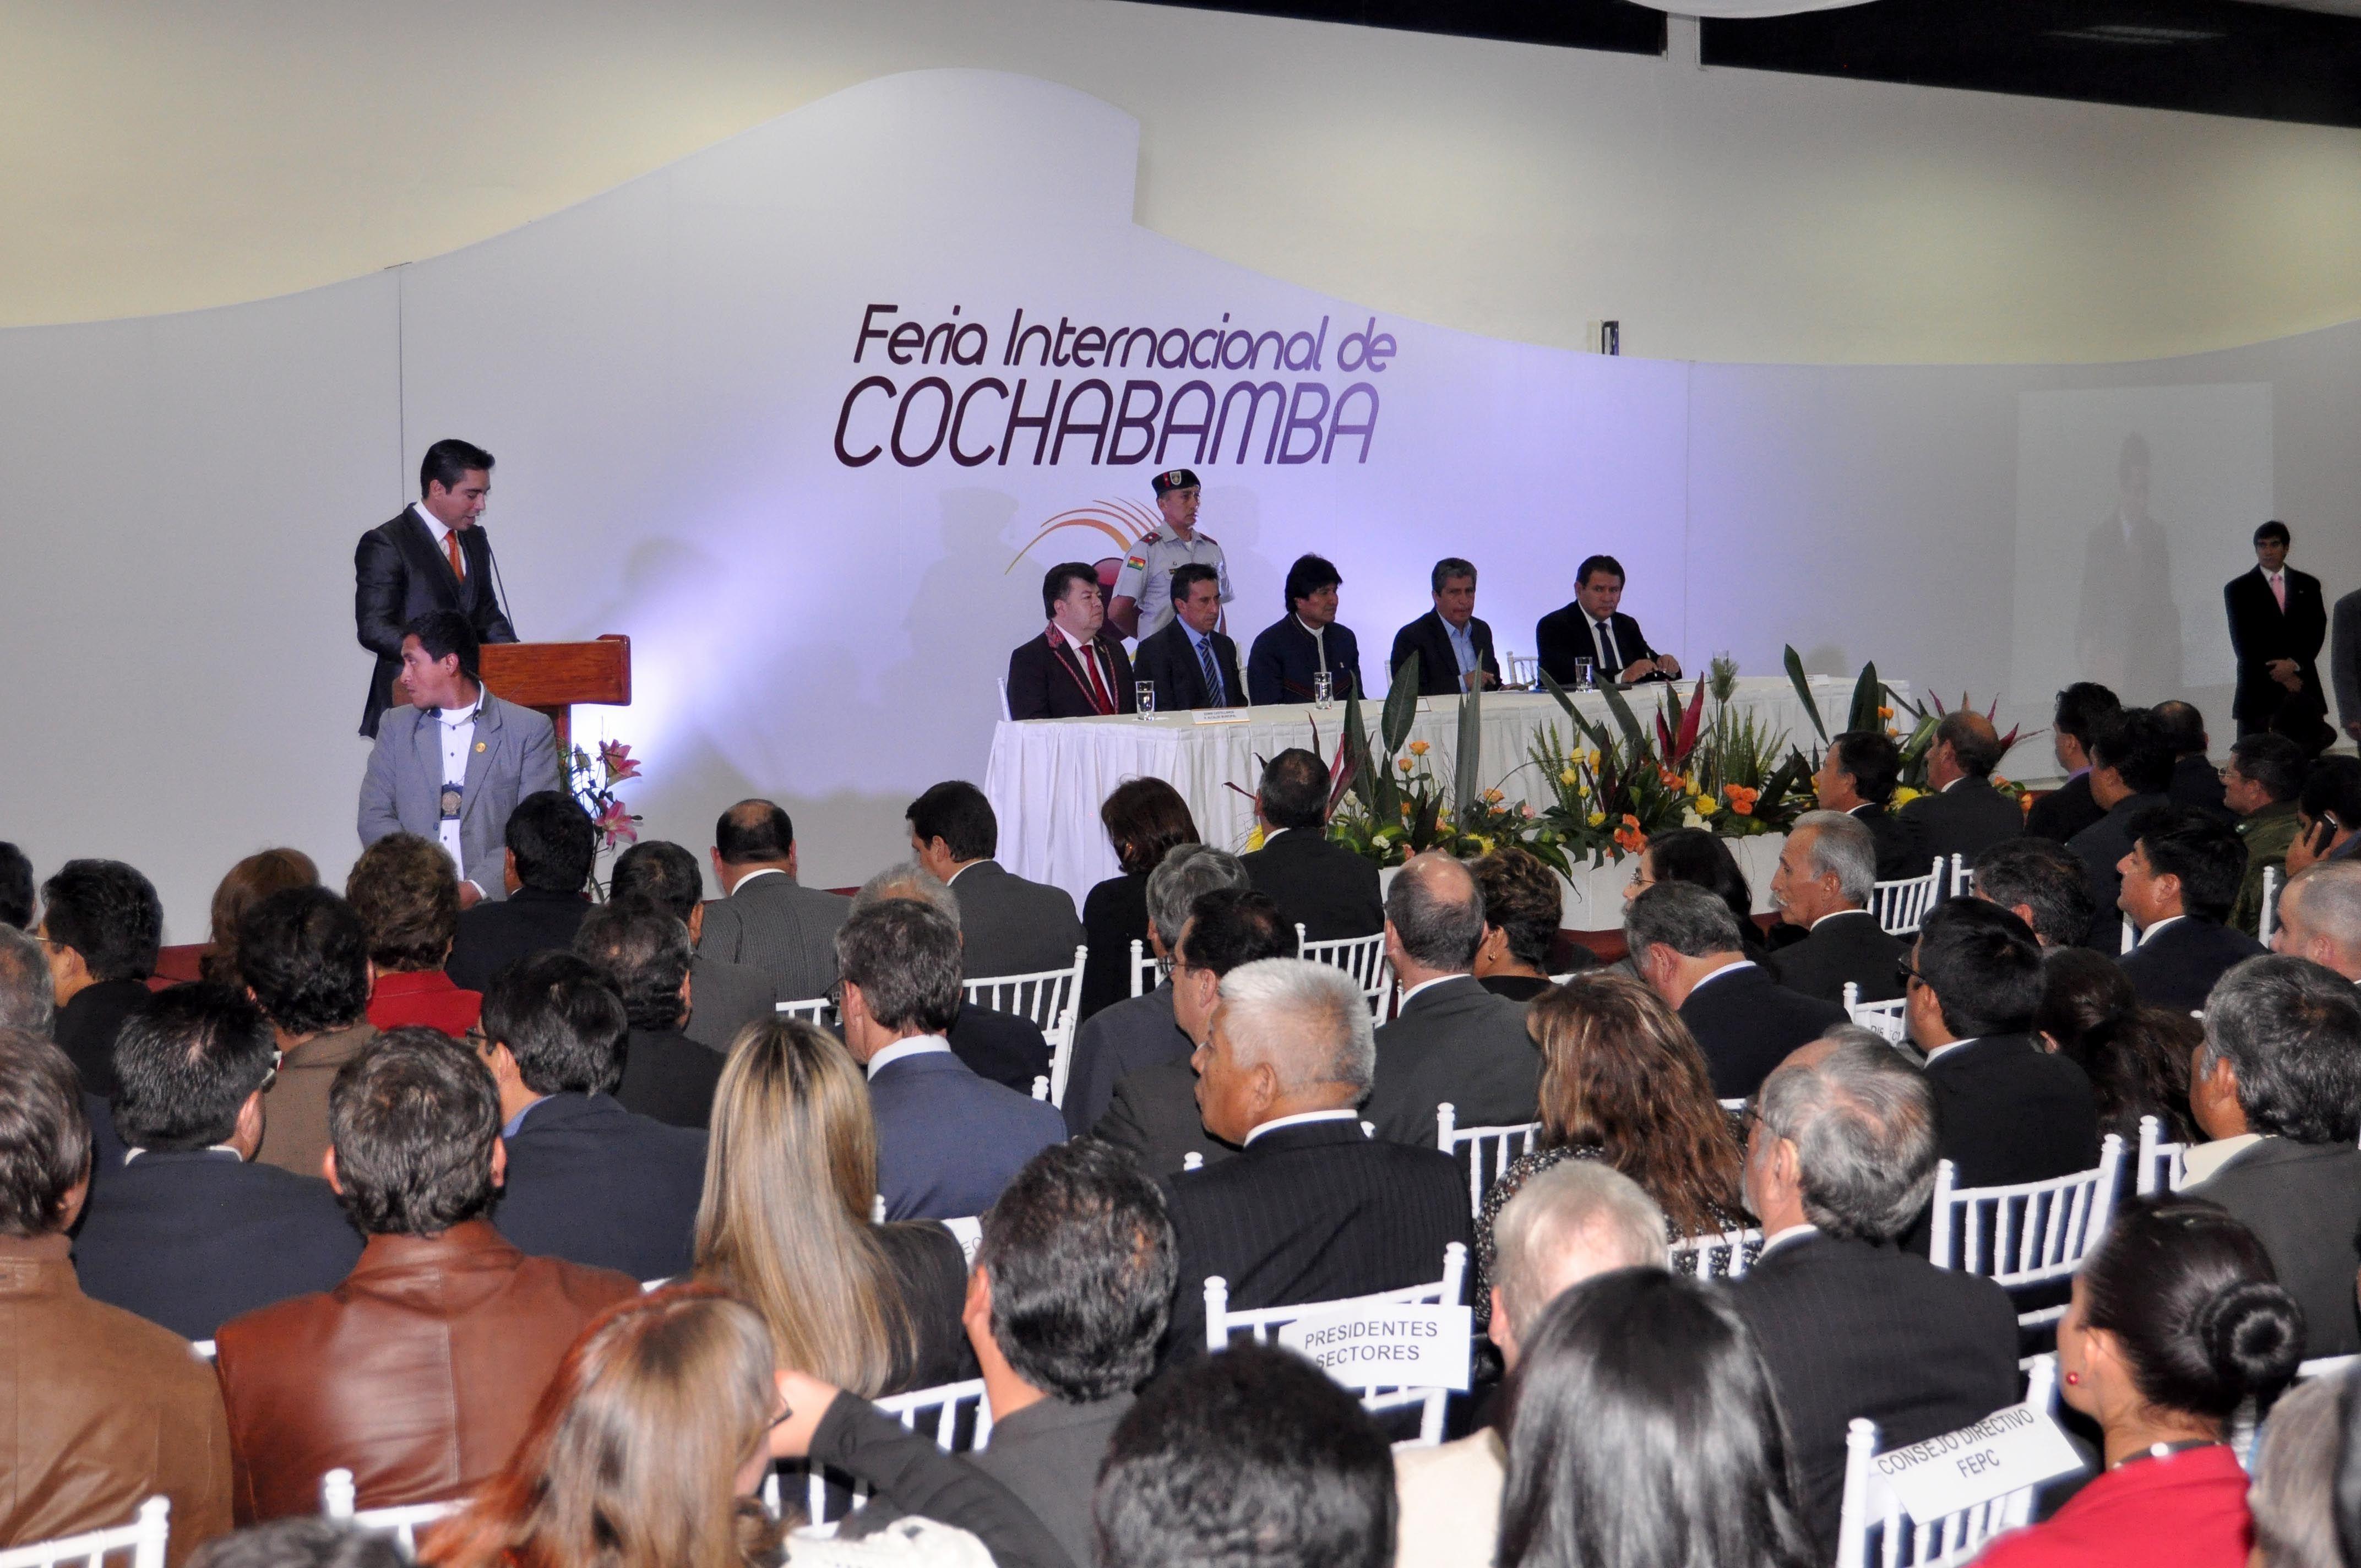 Expo Stand Bolivia : Fundación para la feria internacional de cochabamba